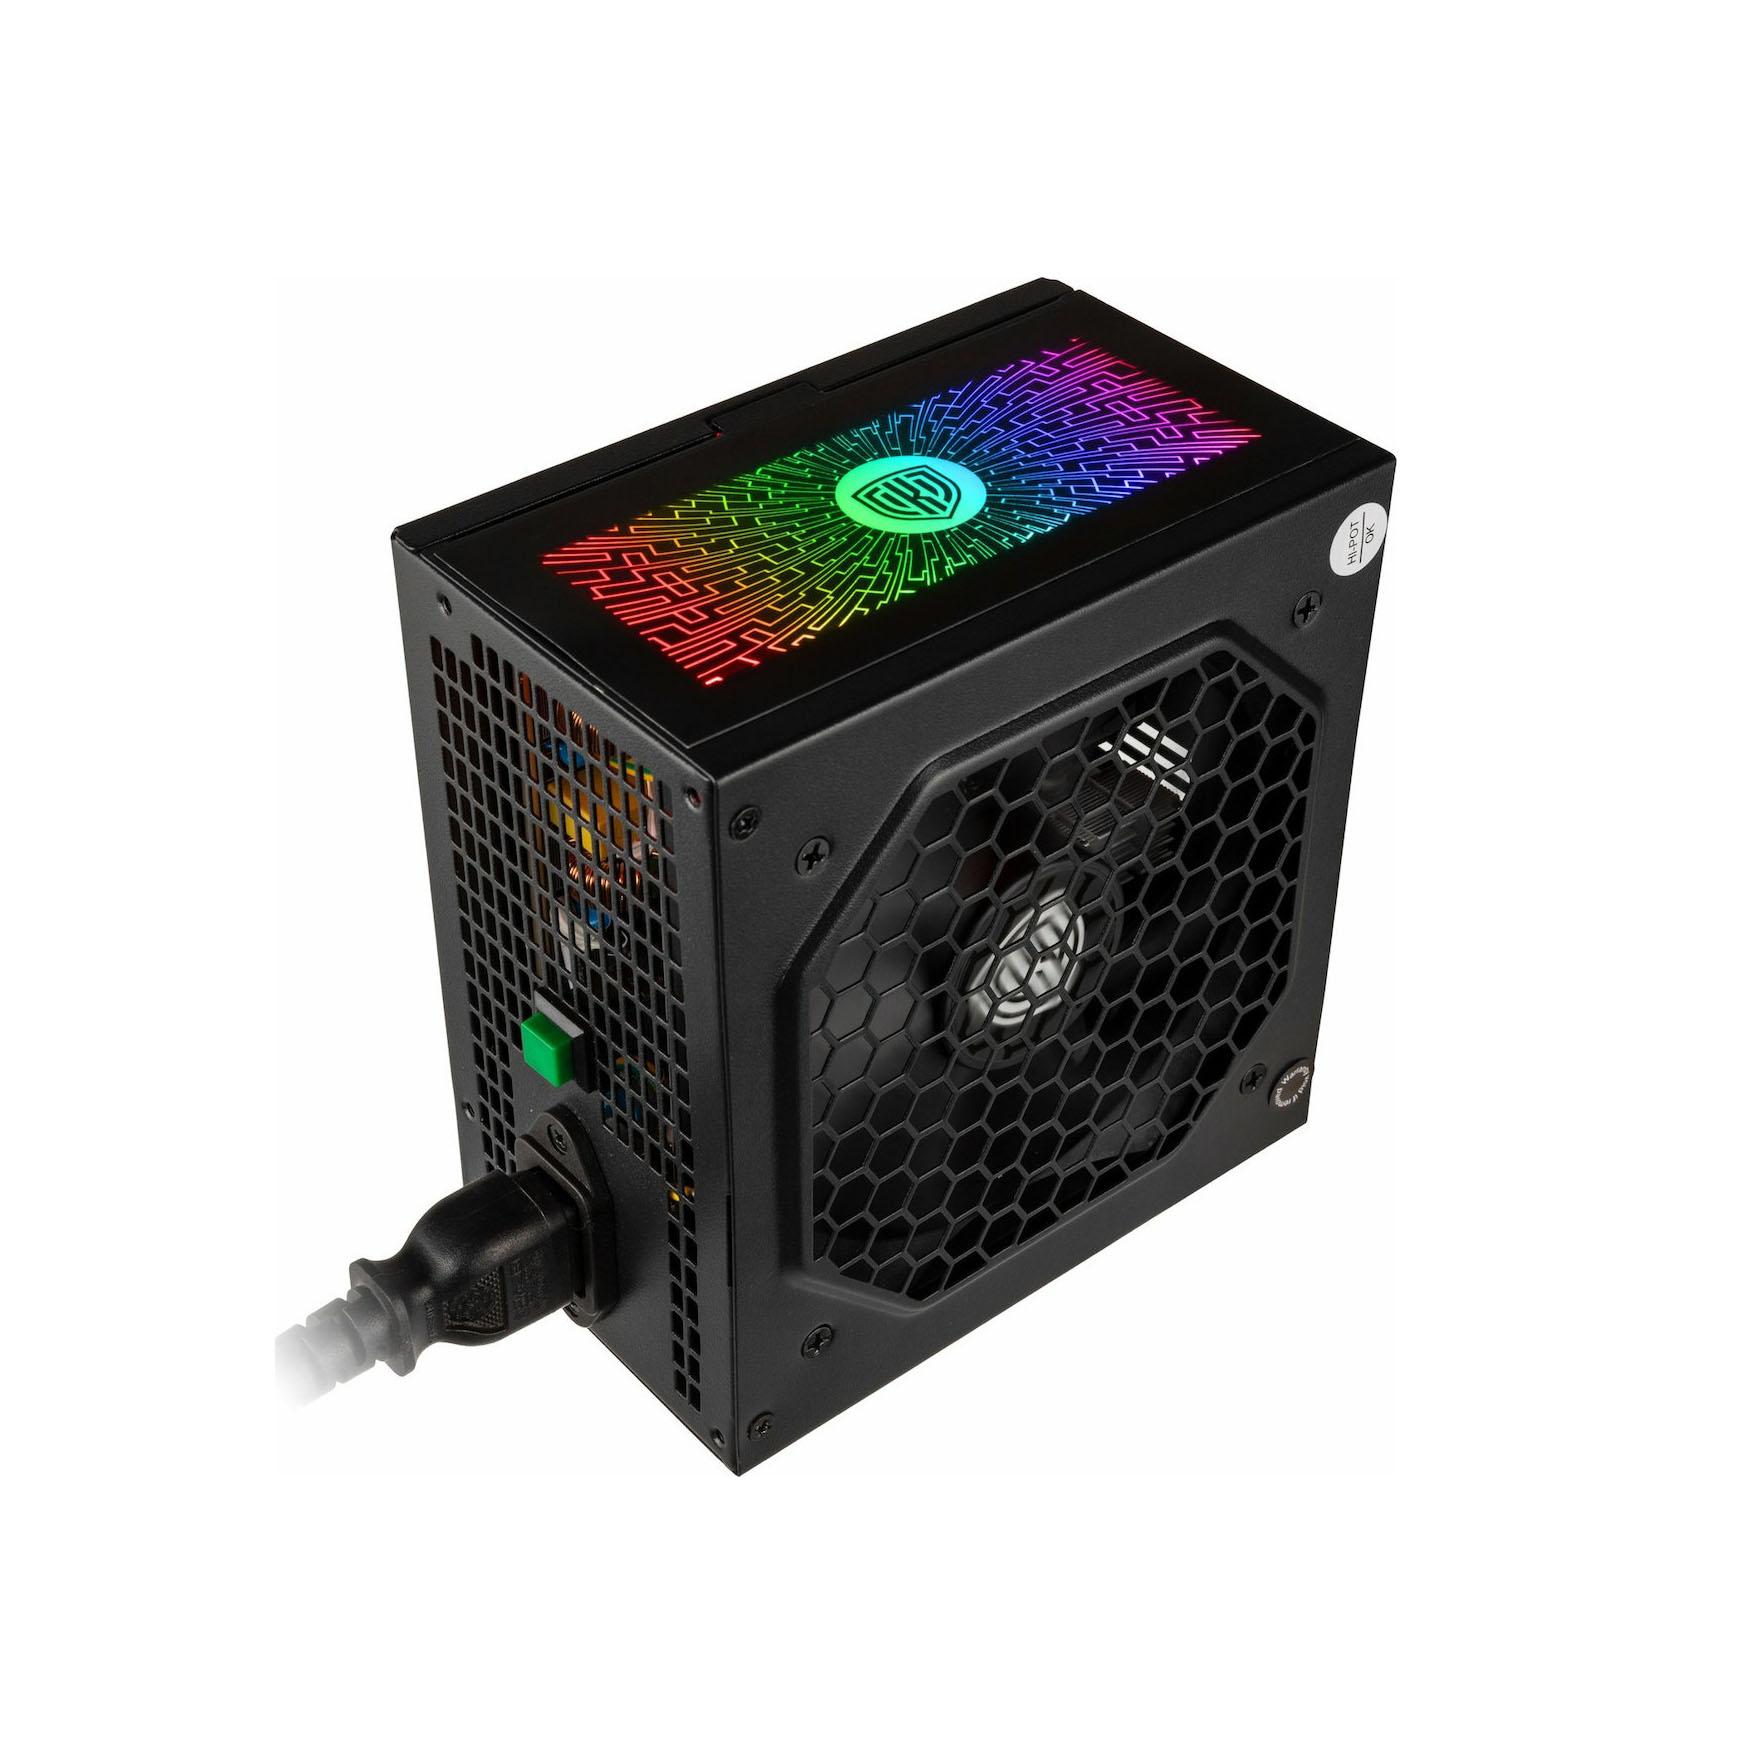 Kolink Core RGB 500W Full Wired Τροφοδοτικό KL-C500RGB